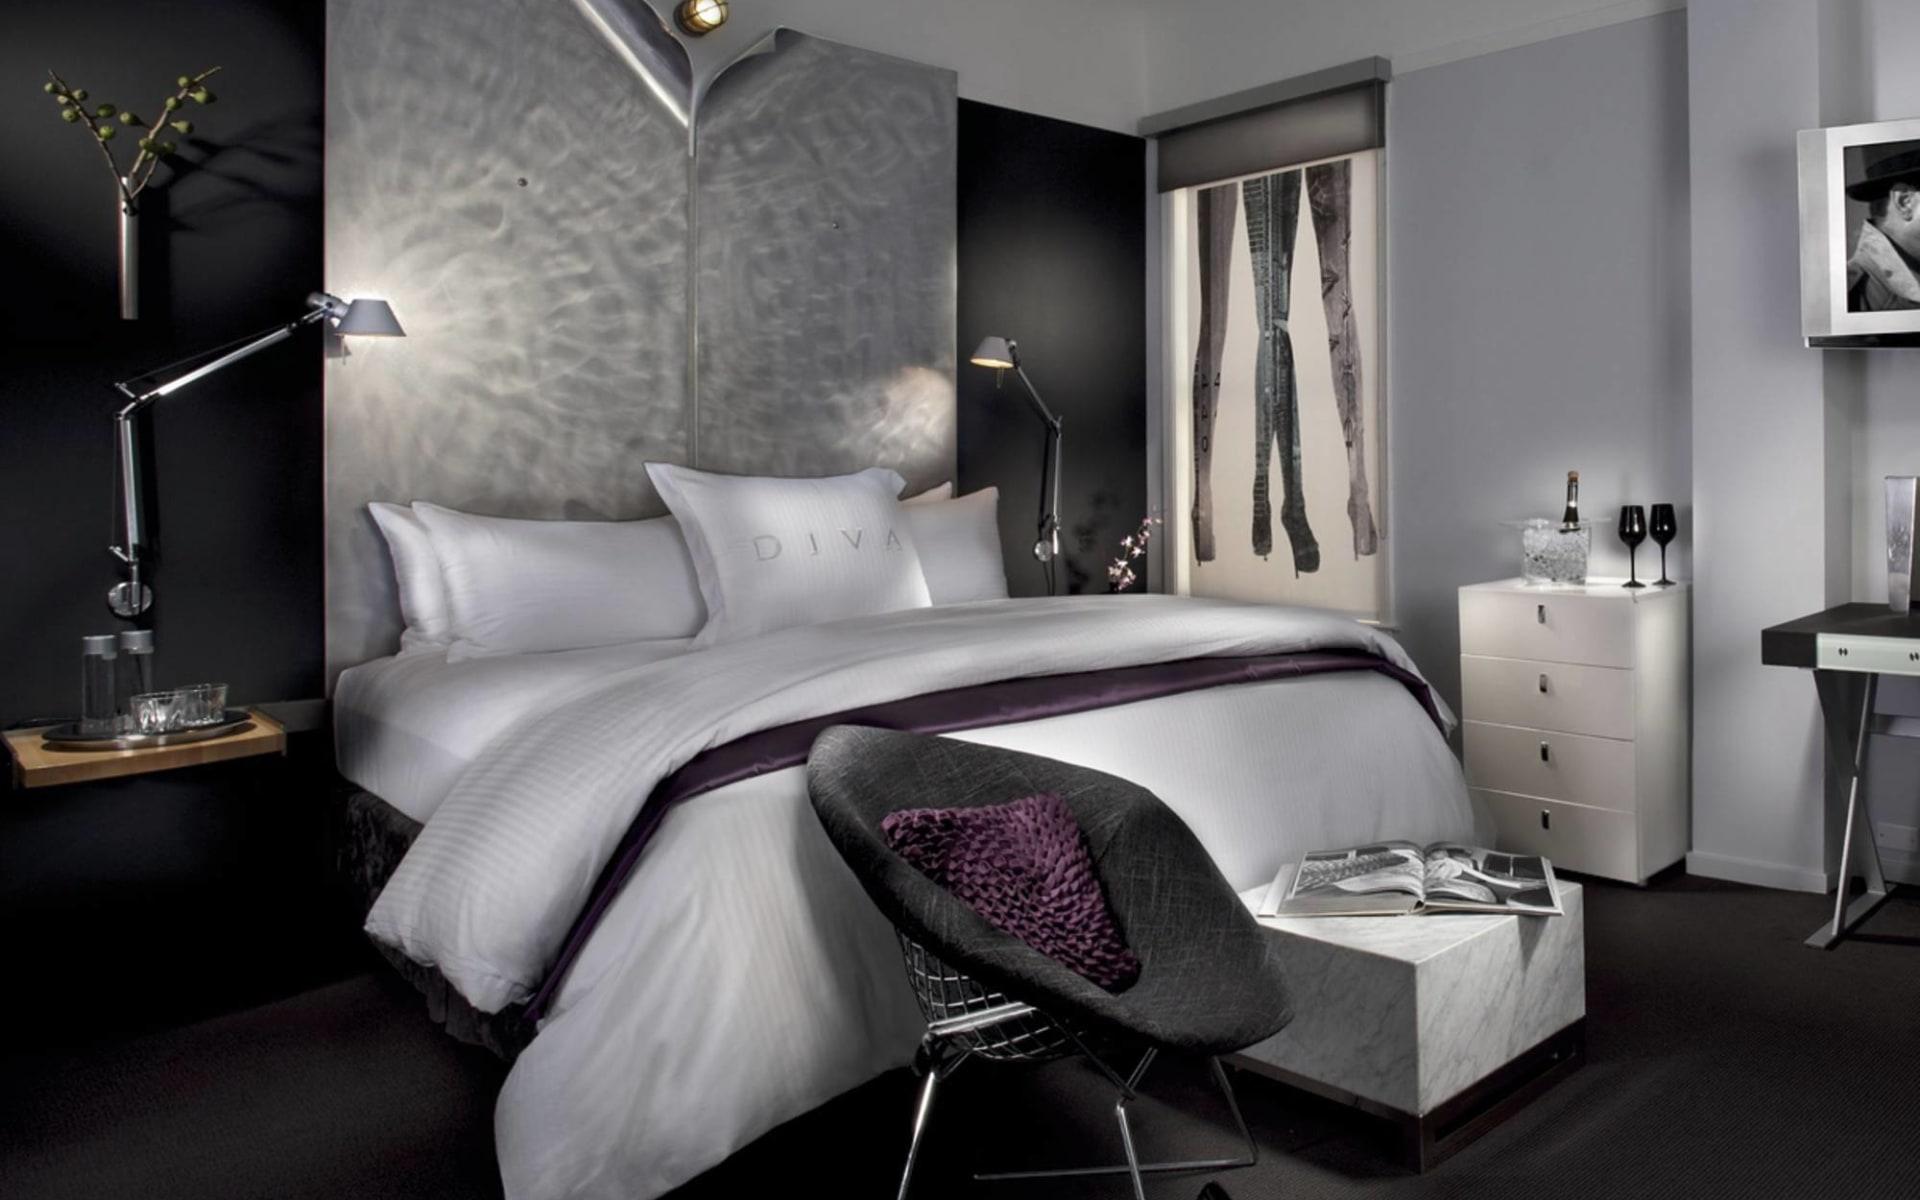 Hotel Diva in San Francisco: zimmer hotel diva doppelzimmer